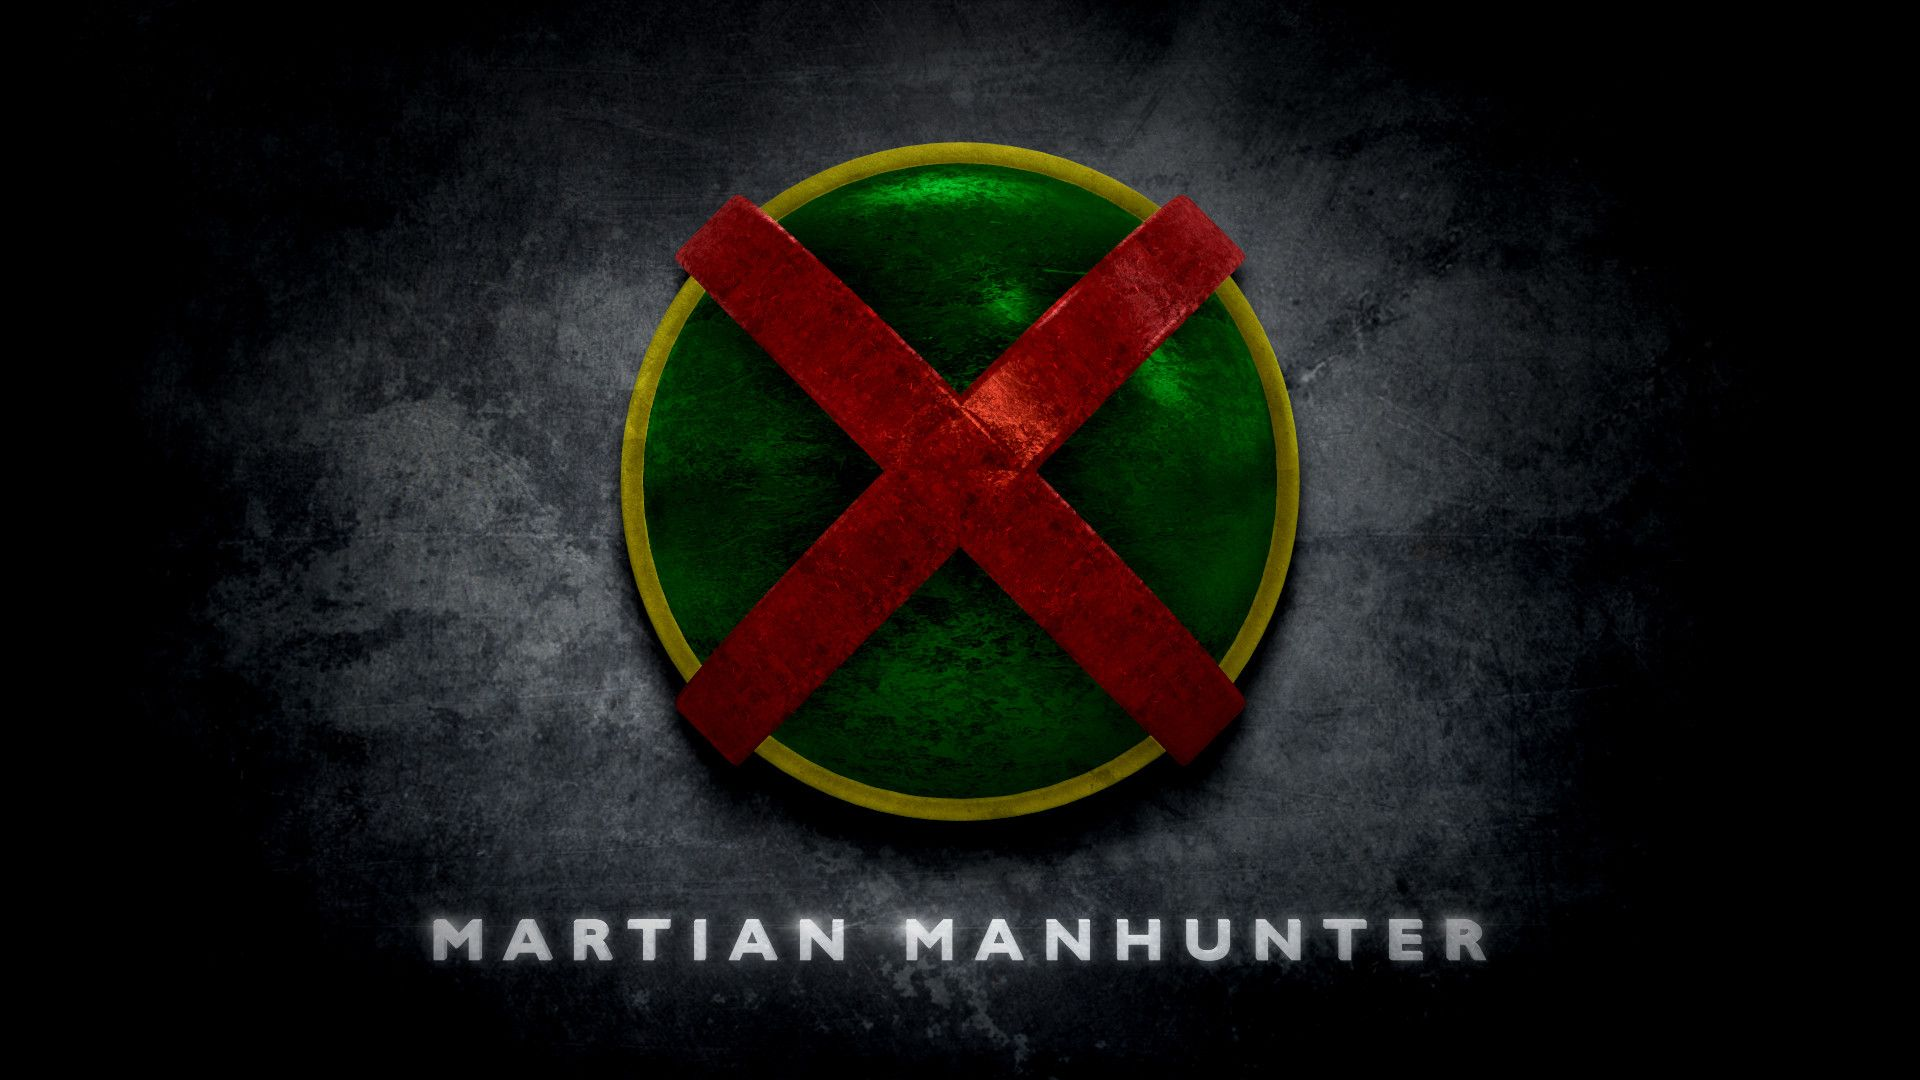 Martian Manhunter Logo | DC Comics | Pinterest